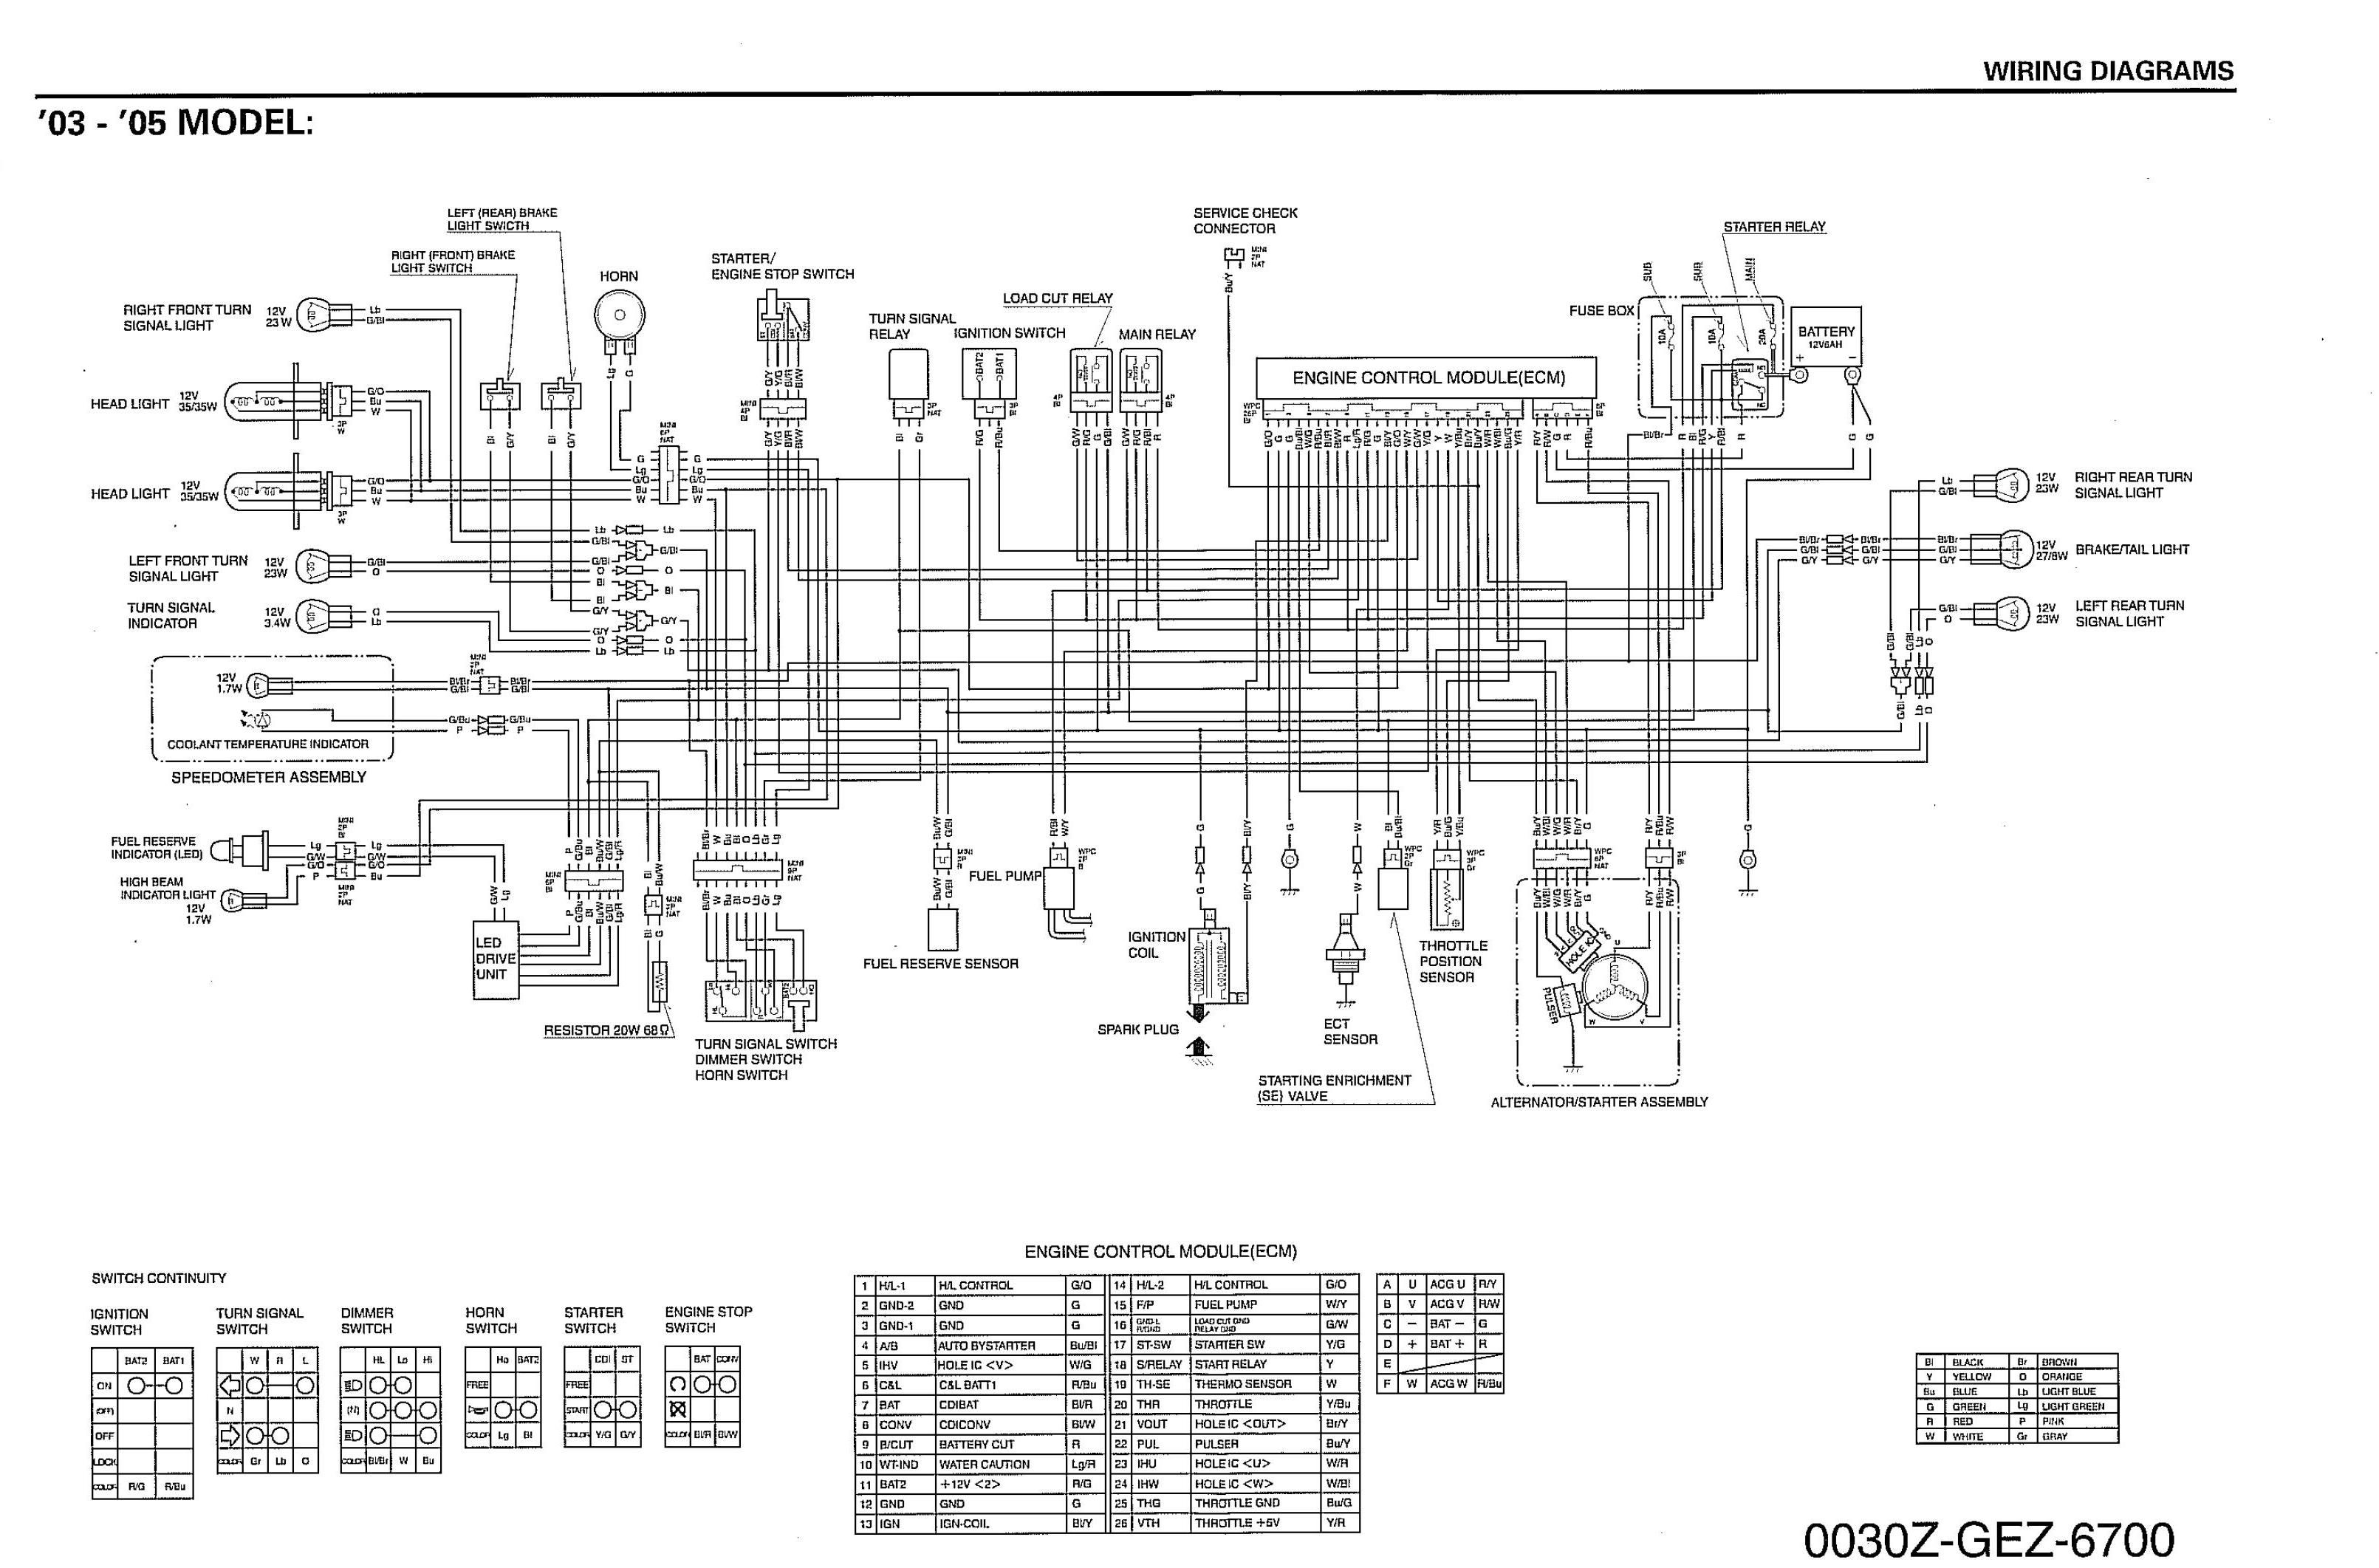 04 rx330 wiring diagrams